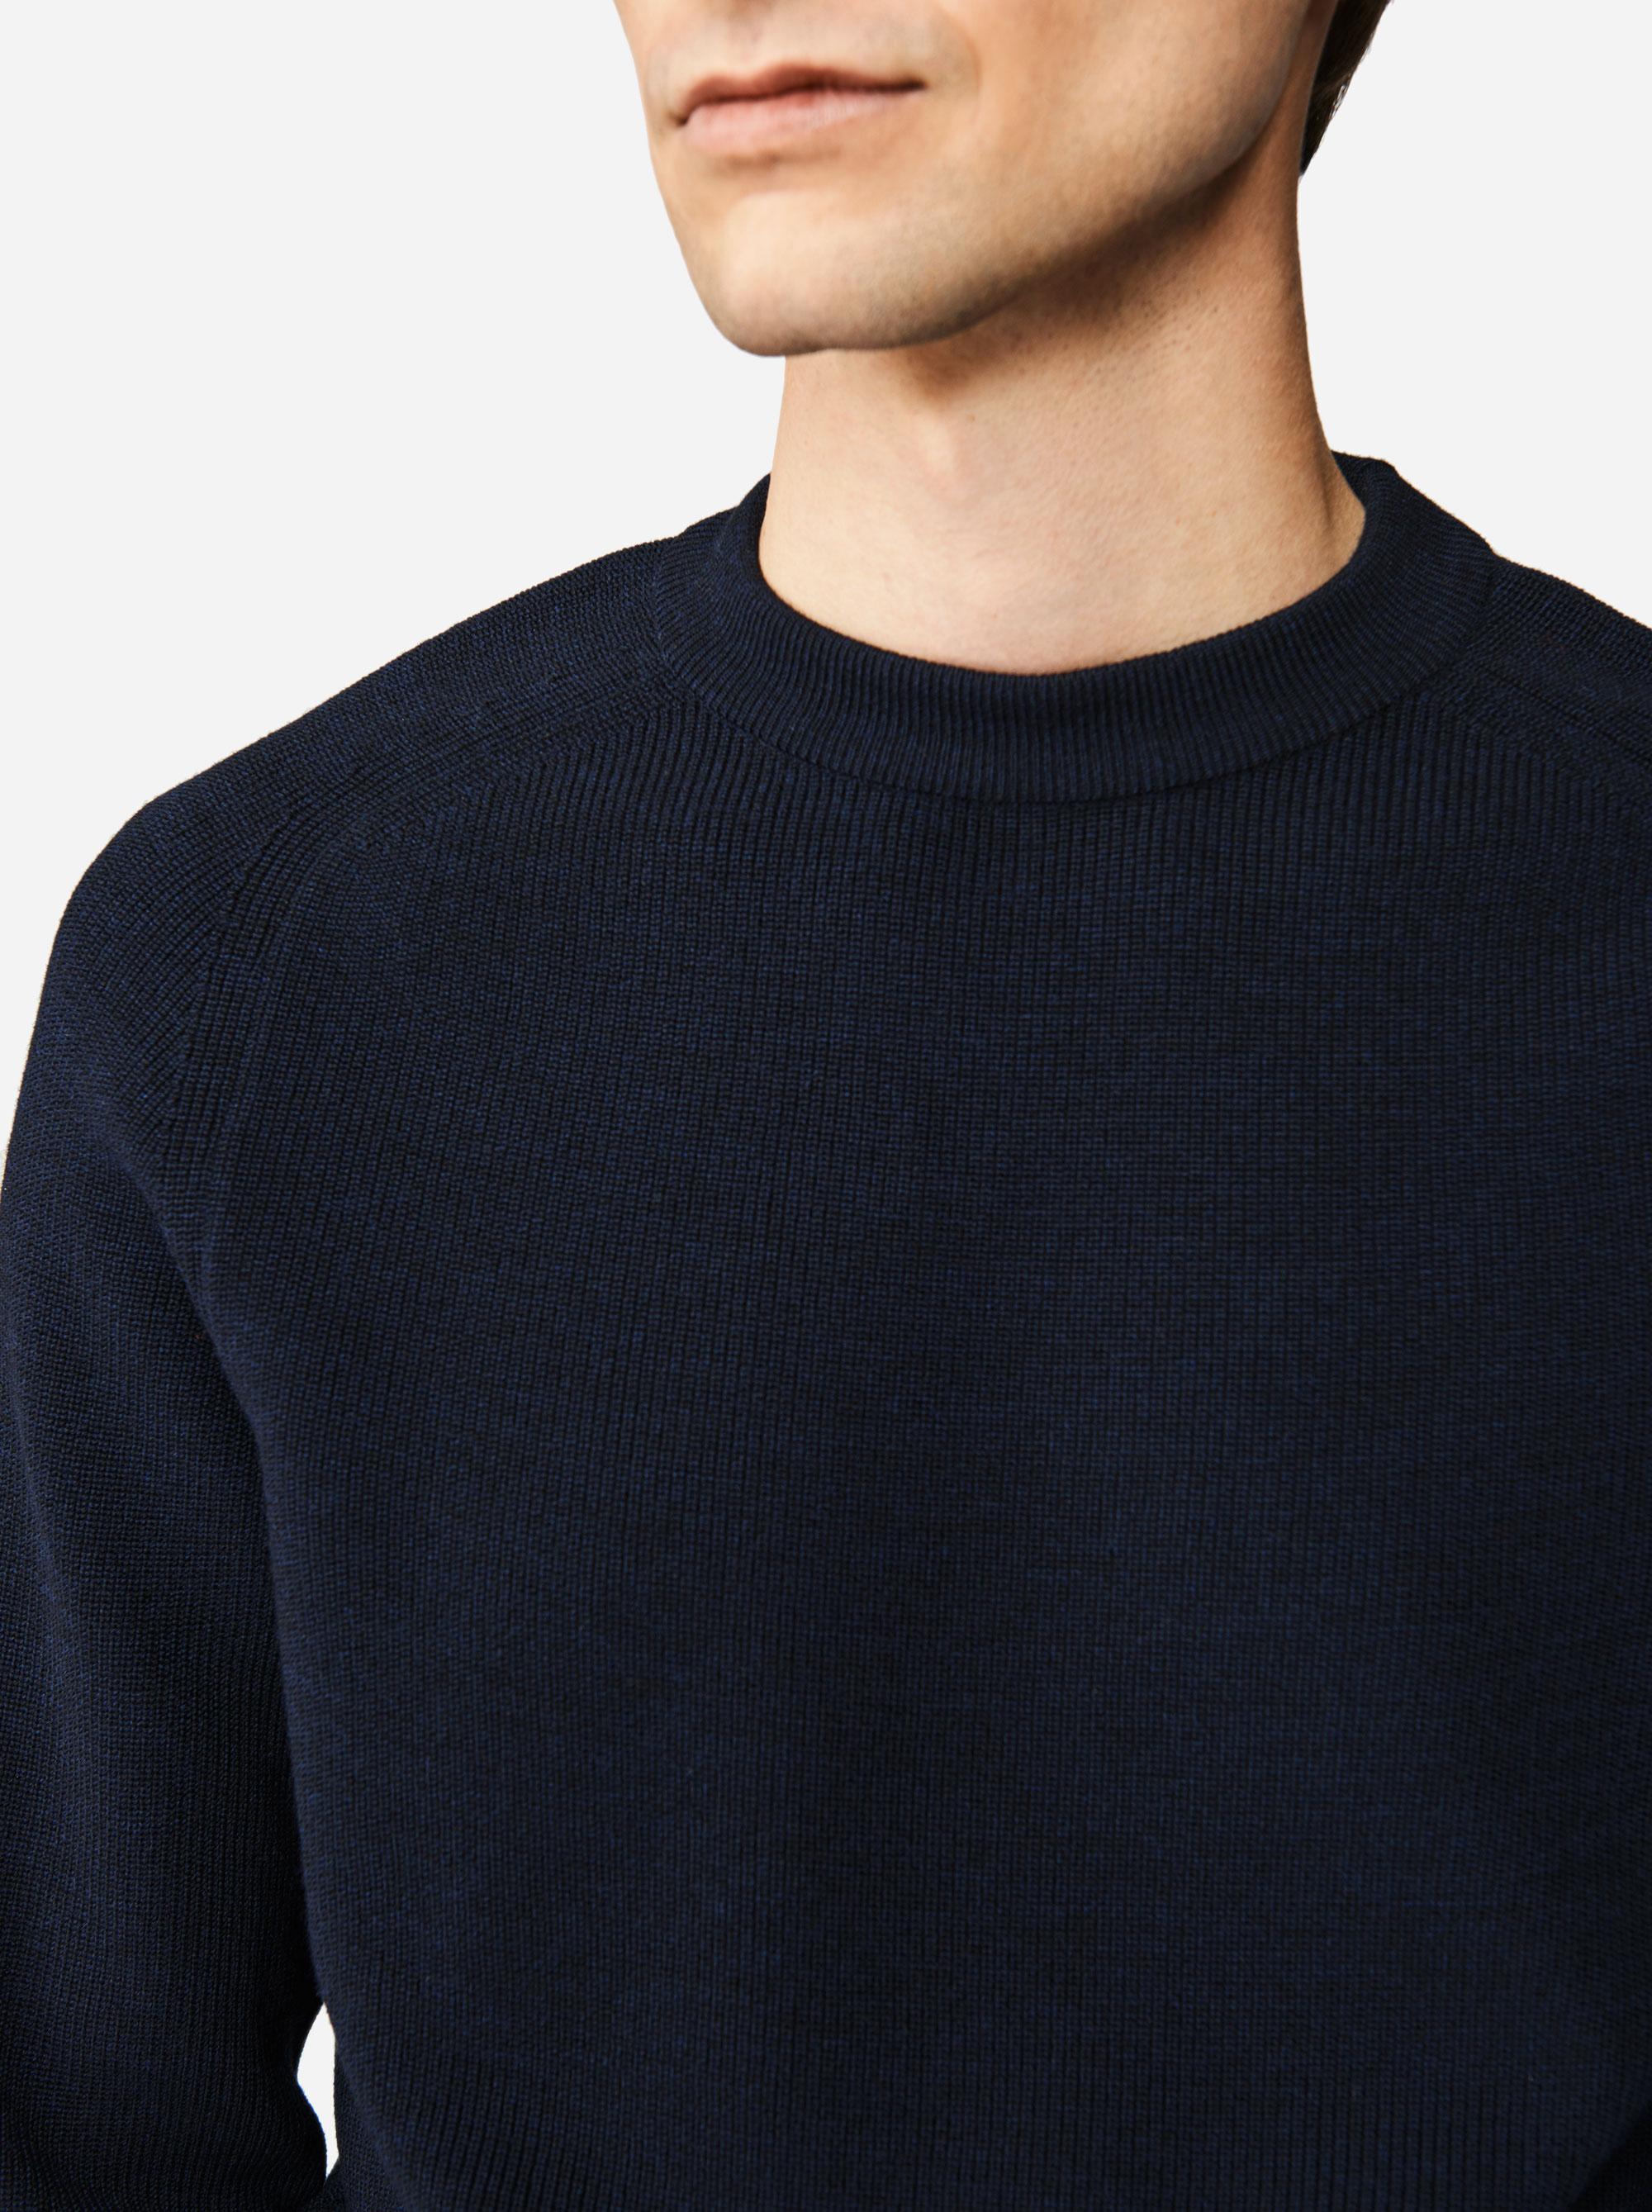 Teym - The Merino Sweater - Men - Blue - 3